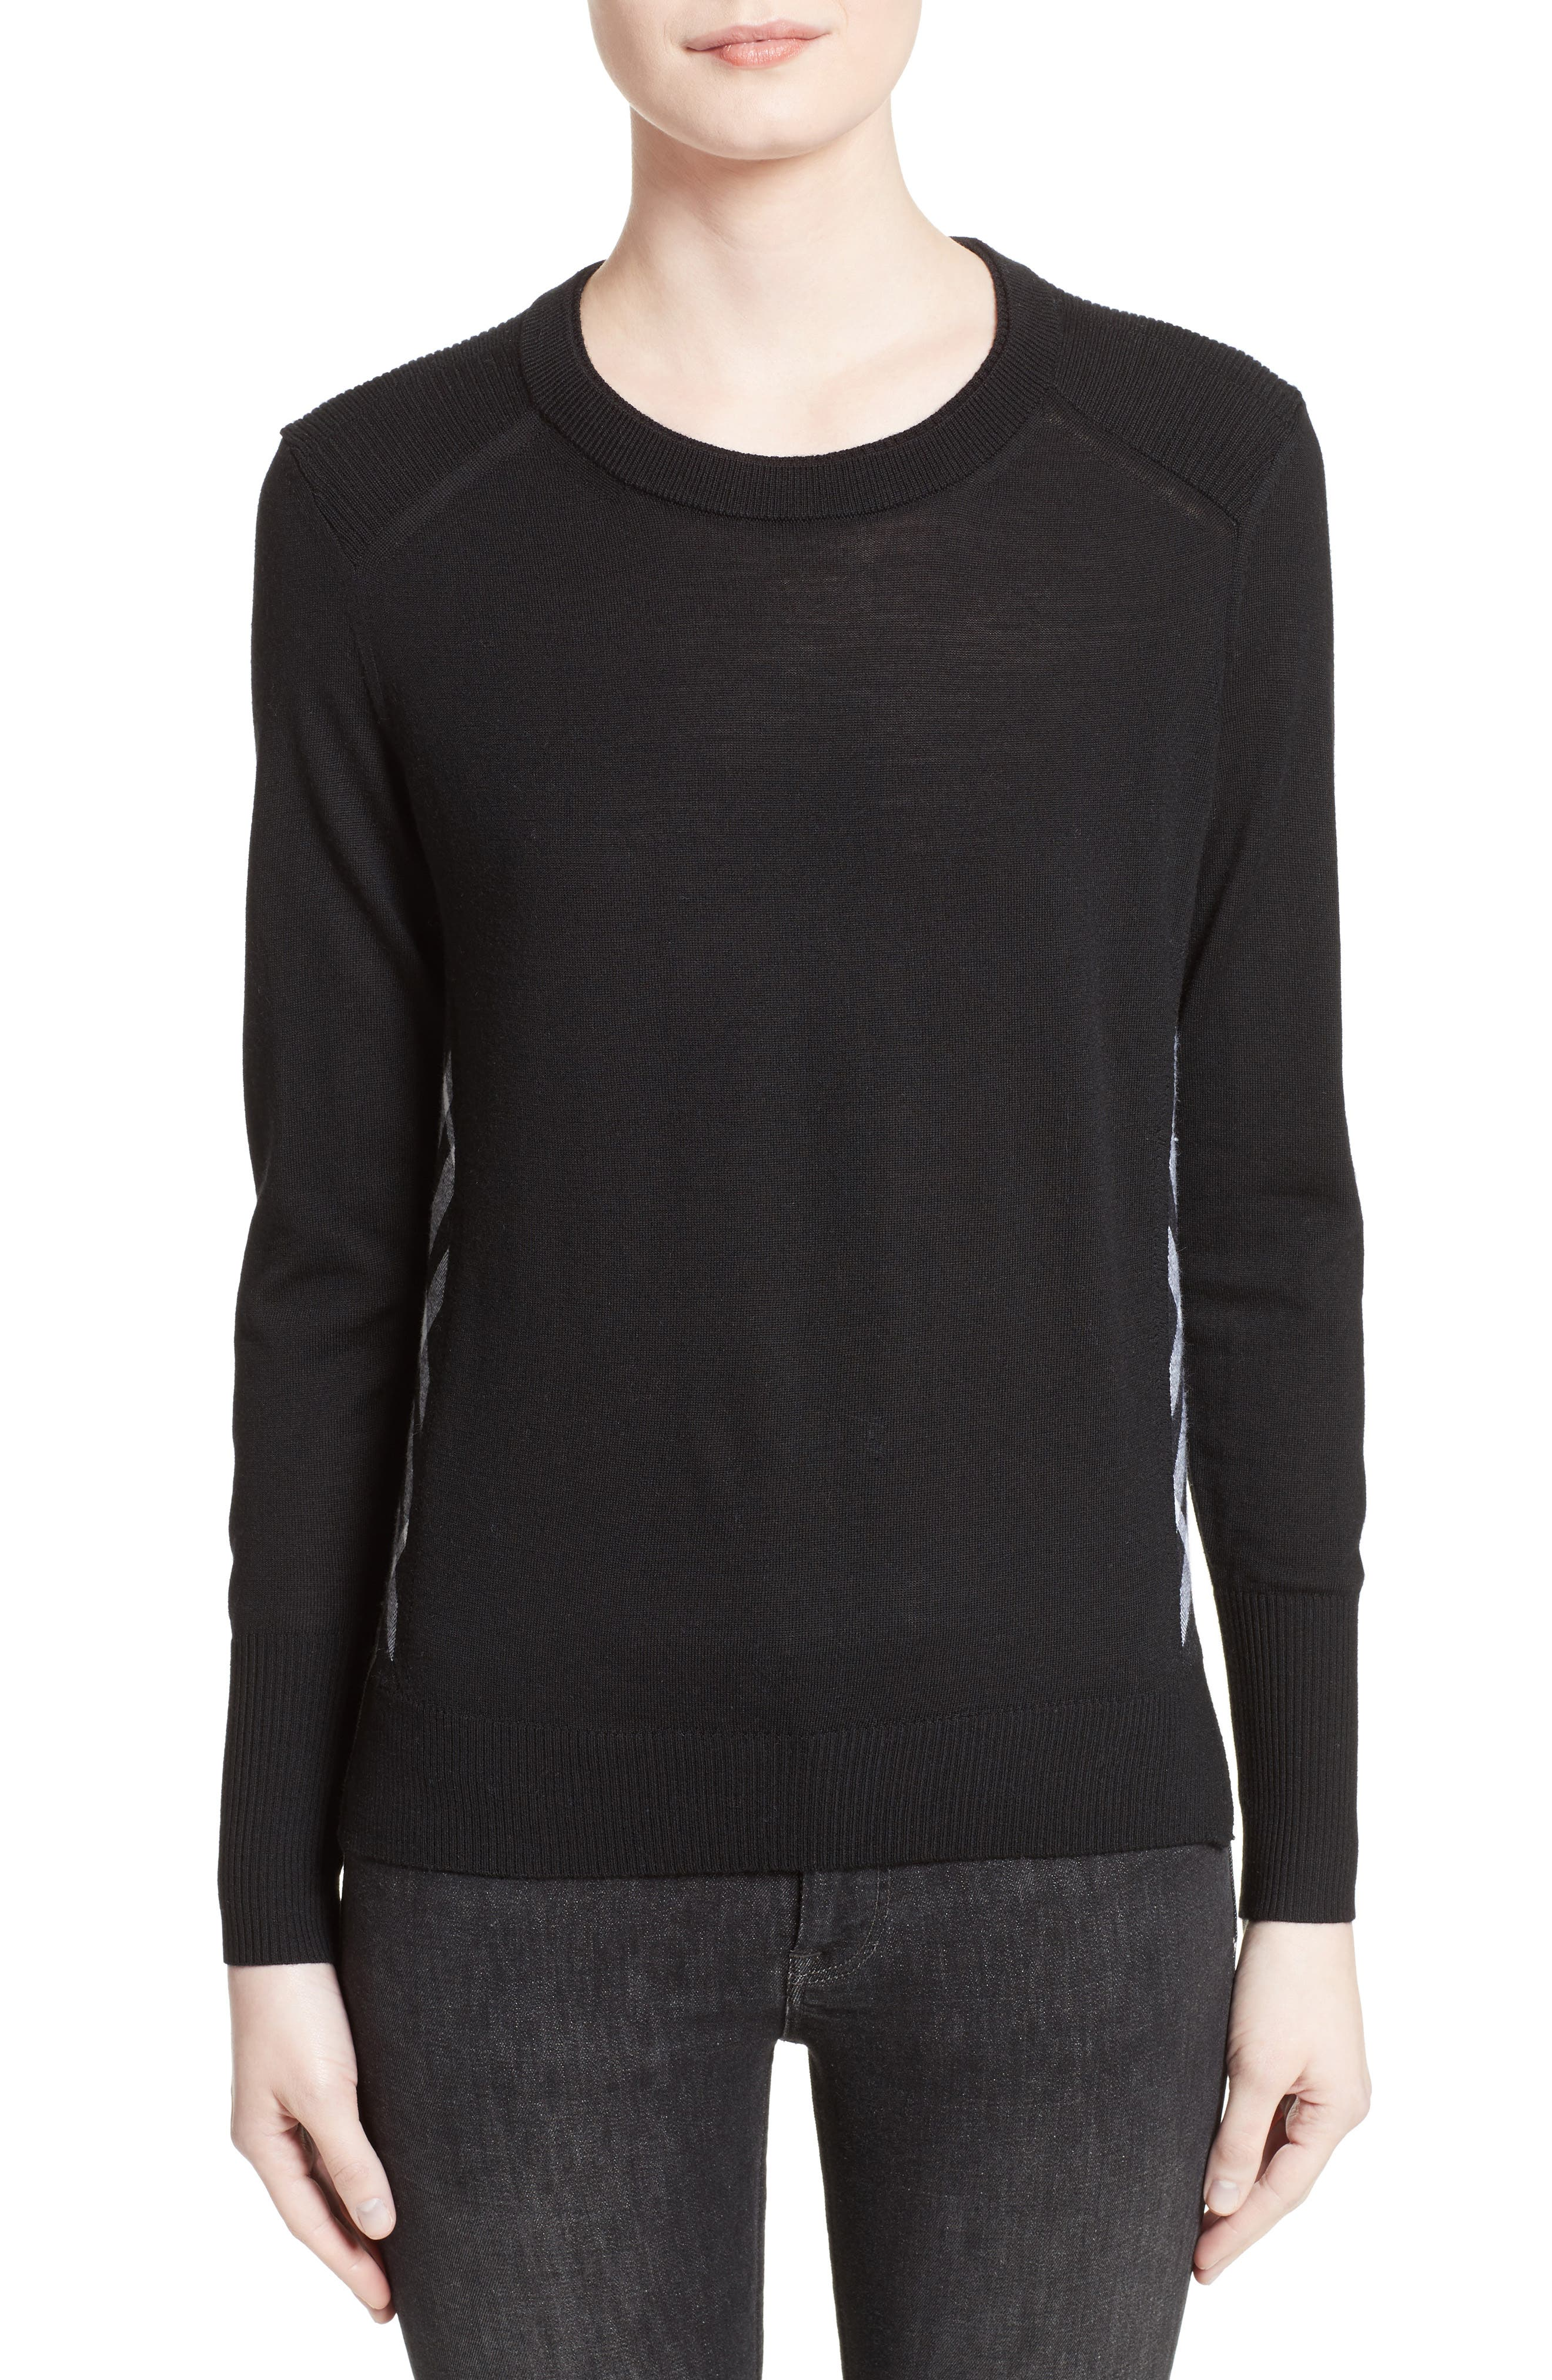 Meigan Merino Wool Sweater,                         Main,                         color, 001